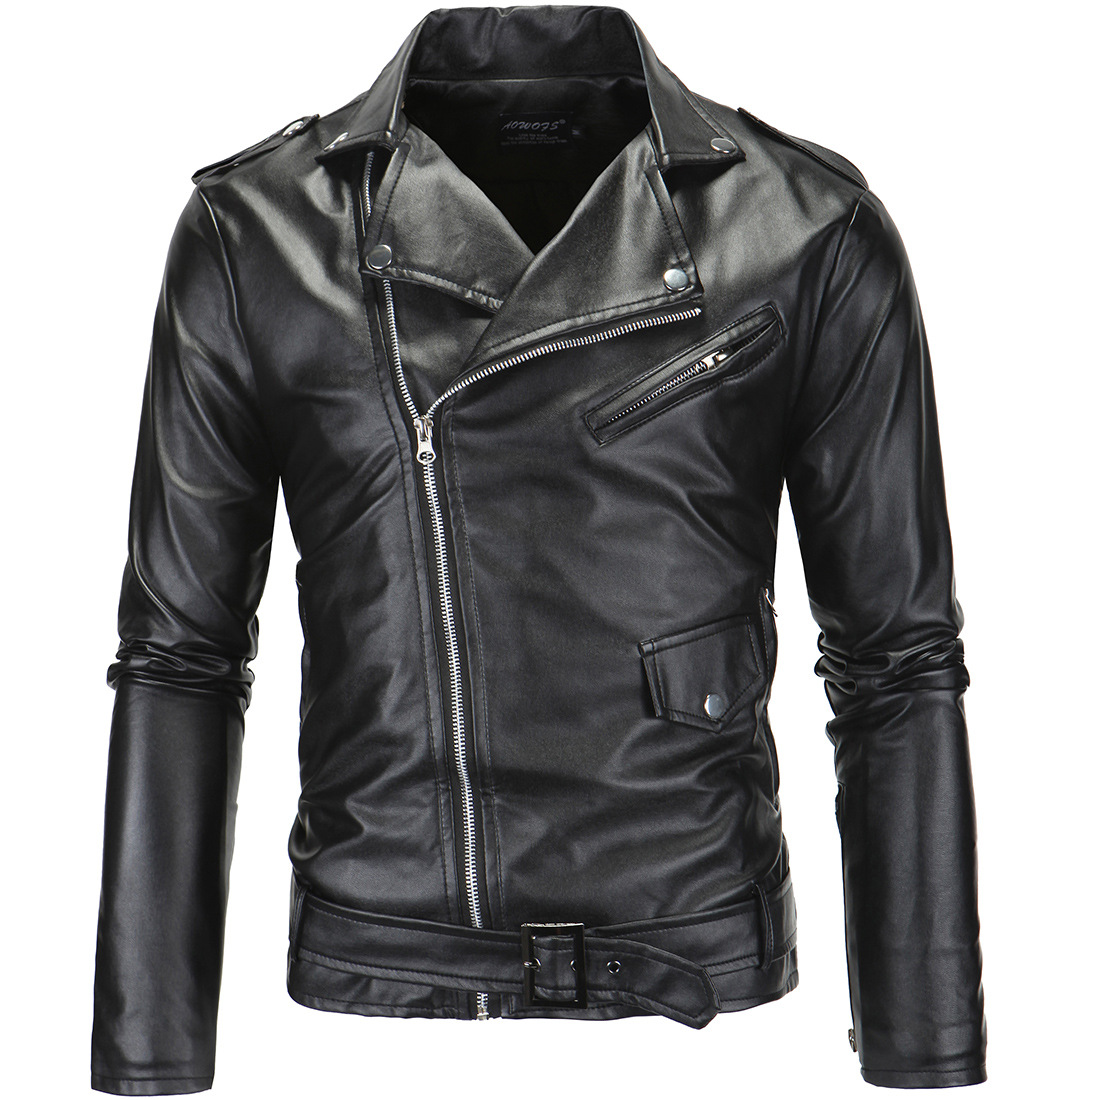 Männer Leder Jacke Jaqueta De Couro Masculina Neue Kommen Marke Motorrad Leder Jacke Männer Herren Leder Jacken Mäntel Dauerhafte Modellierung